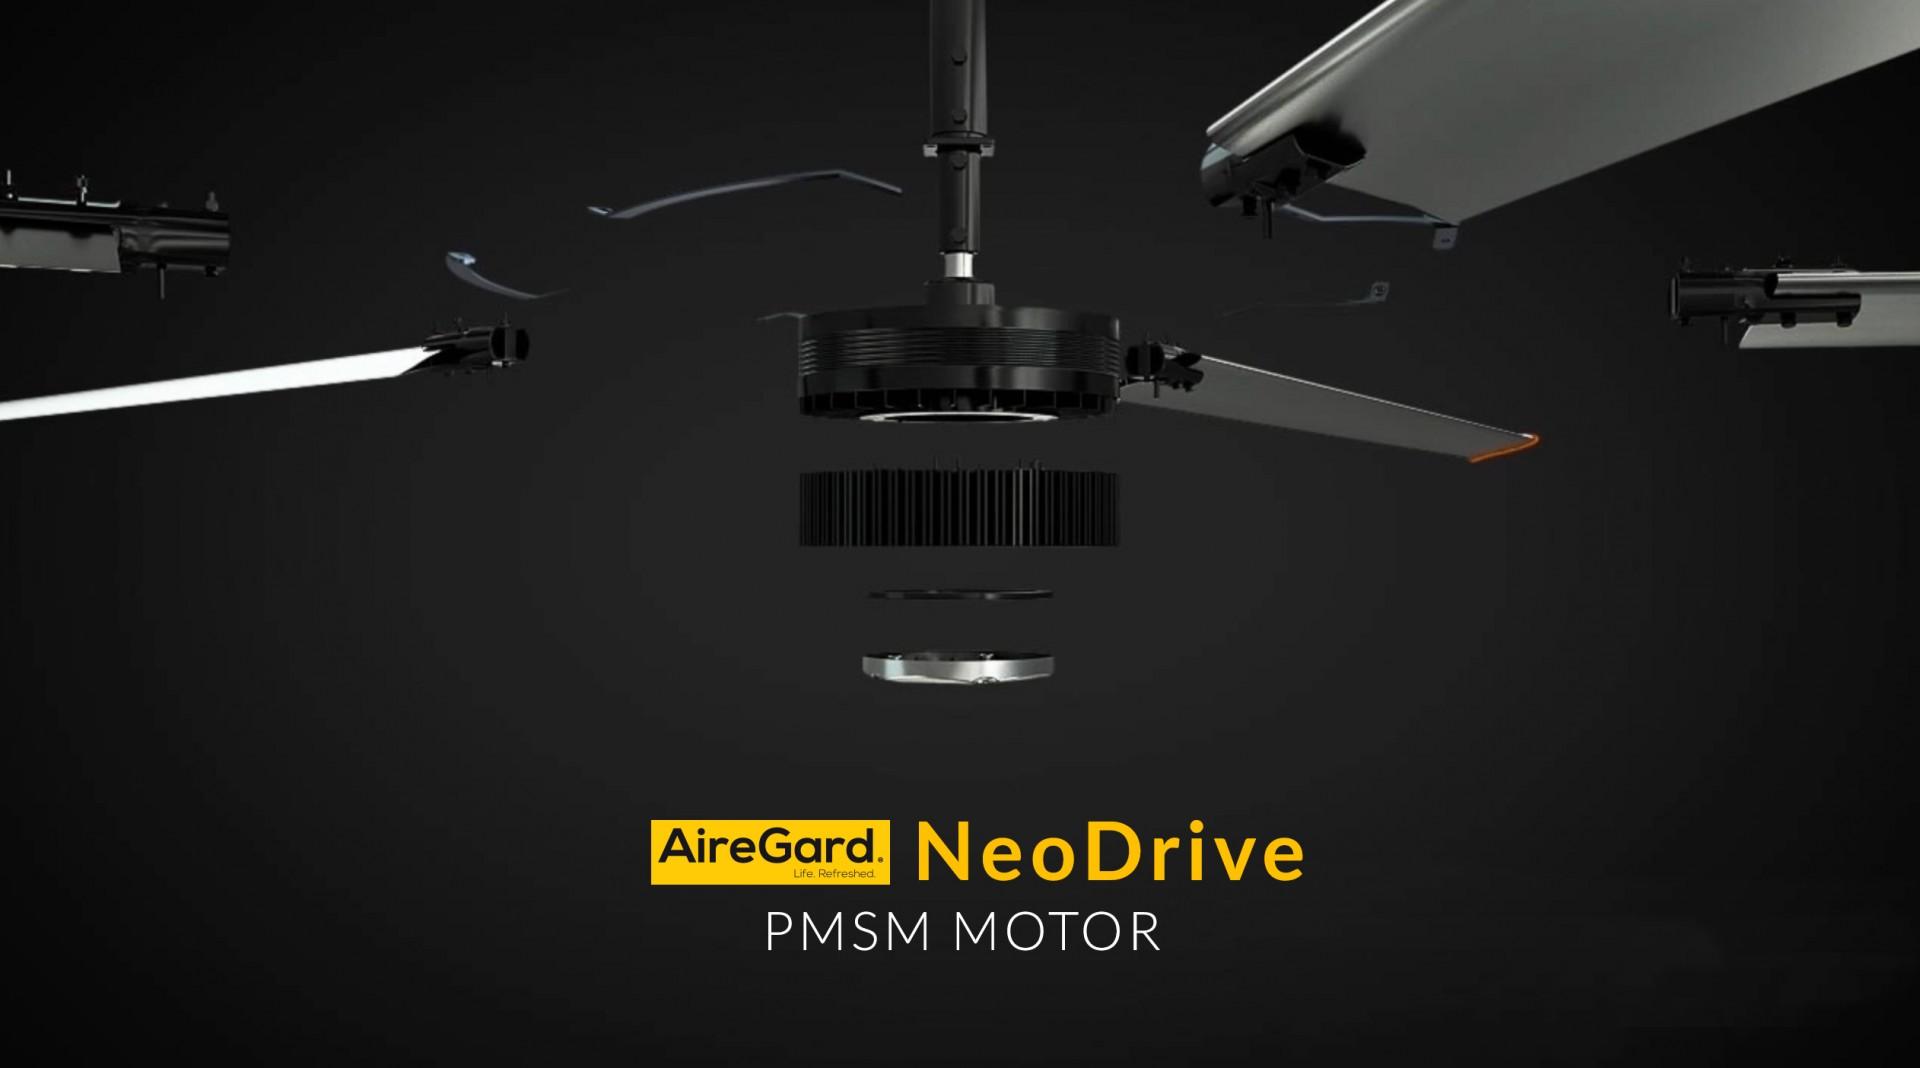 20200728 - NeoDrive HVLS Motor 2 (d)